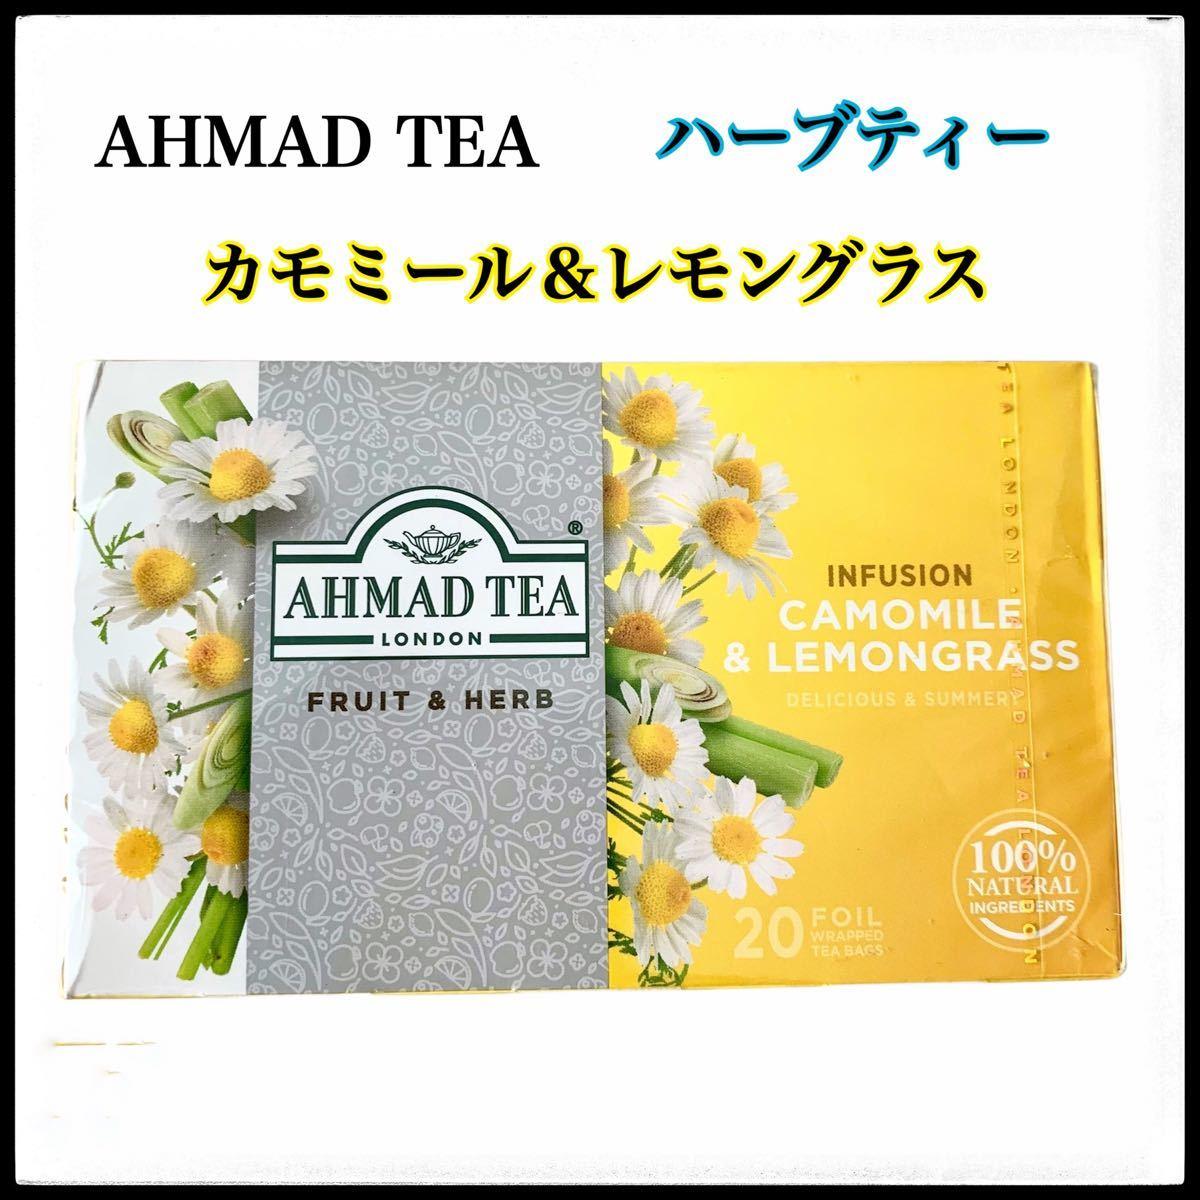 AHMADTEA ハーブティー カモミール レモングラス tea bag 20袋 ノンカフェイン